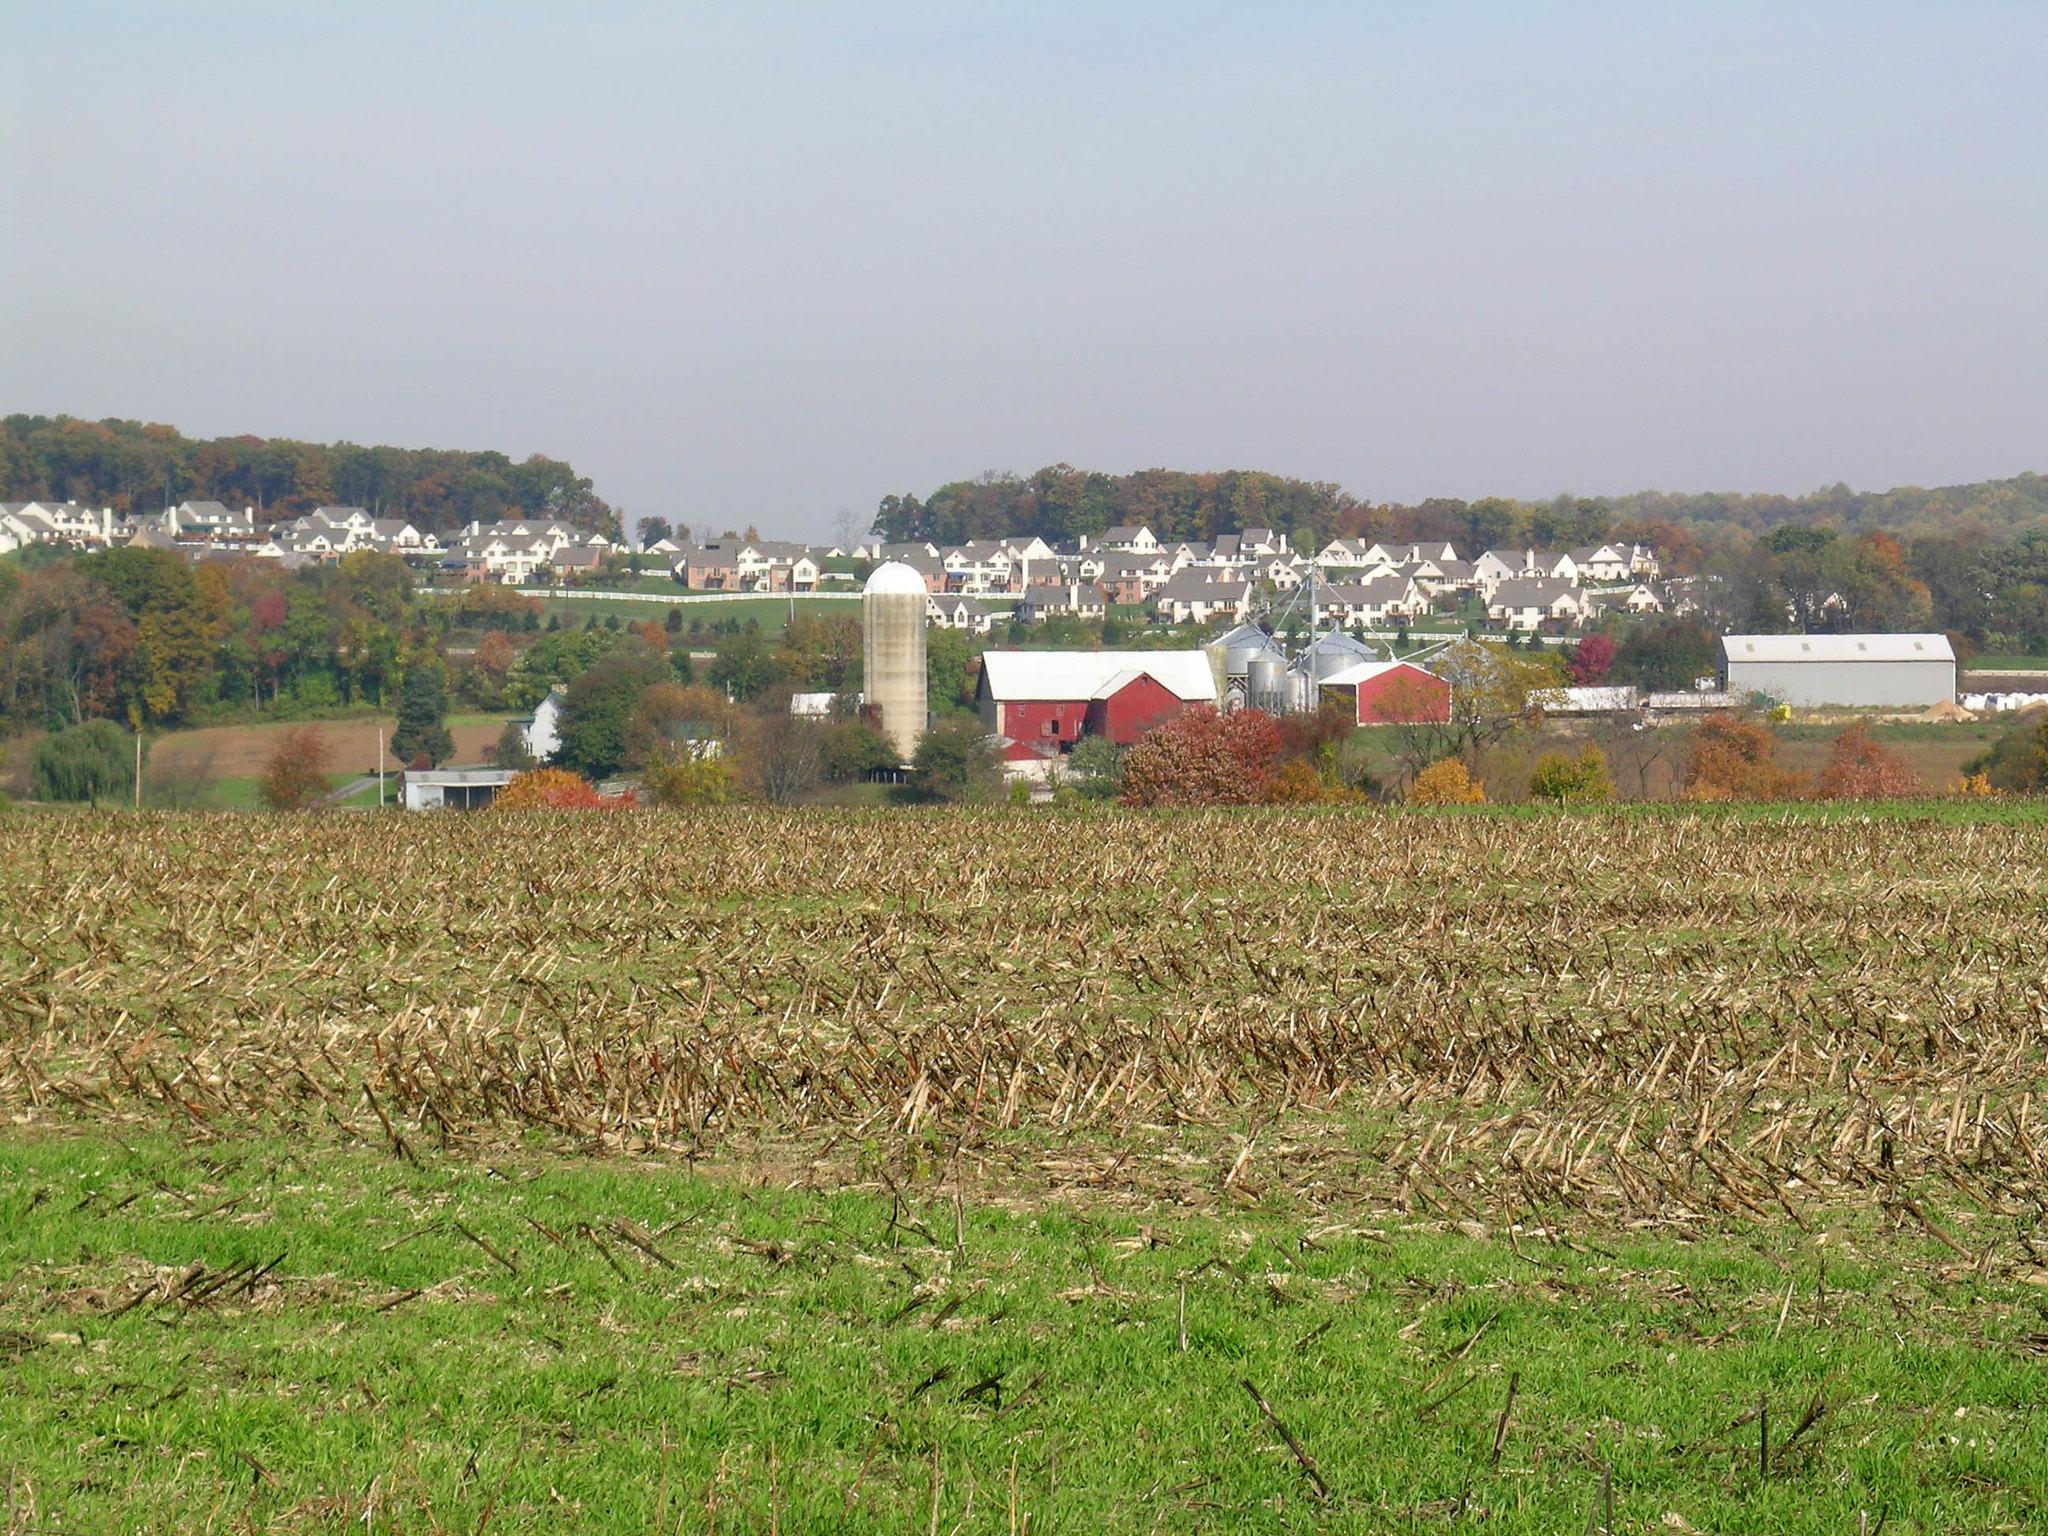 Three Chester County Farms Added to Pennsylvania's Nation-Leading Farmland Preservation Program